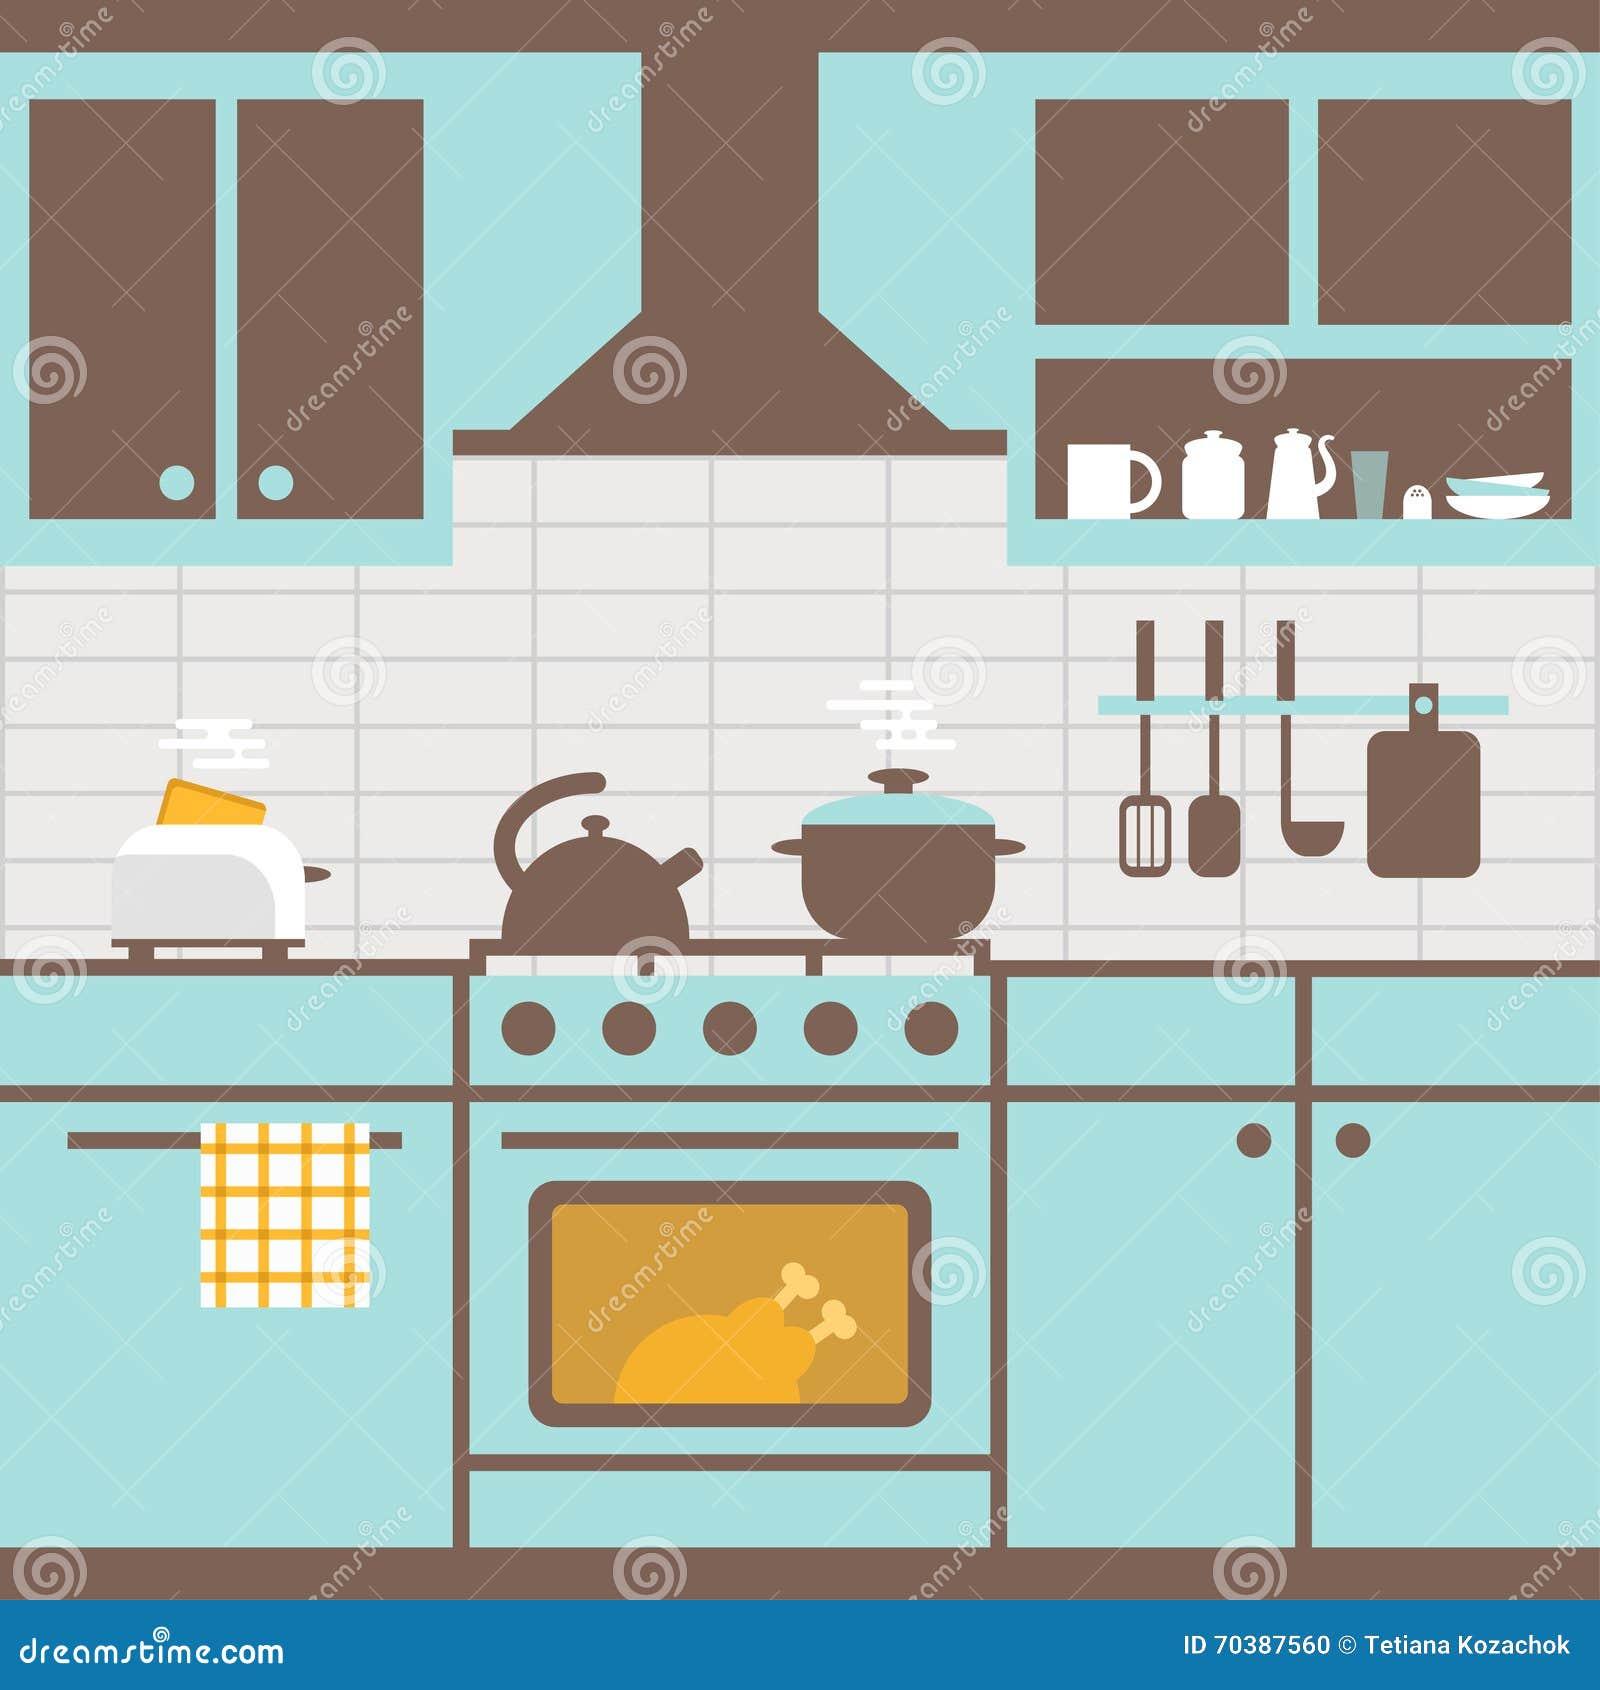 Vector Illustration Of Kitchen With Furniture. Kitchen Utensils ...